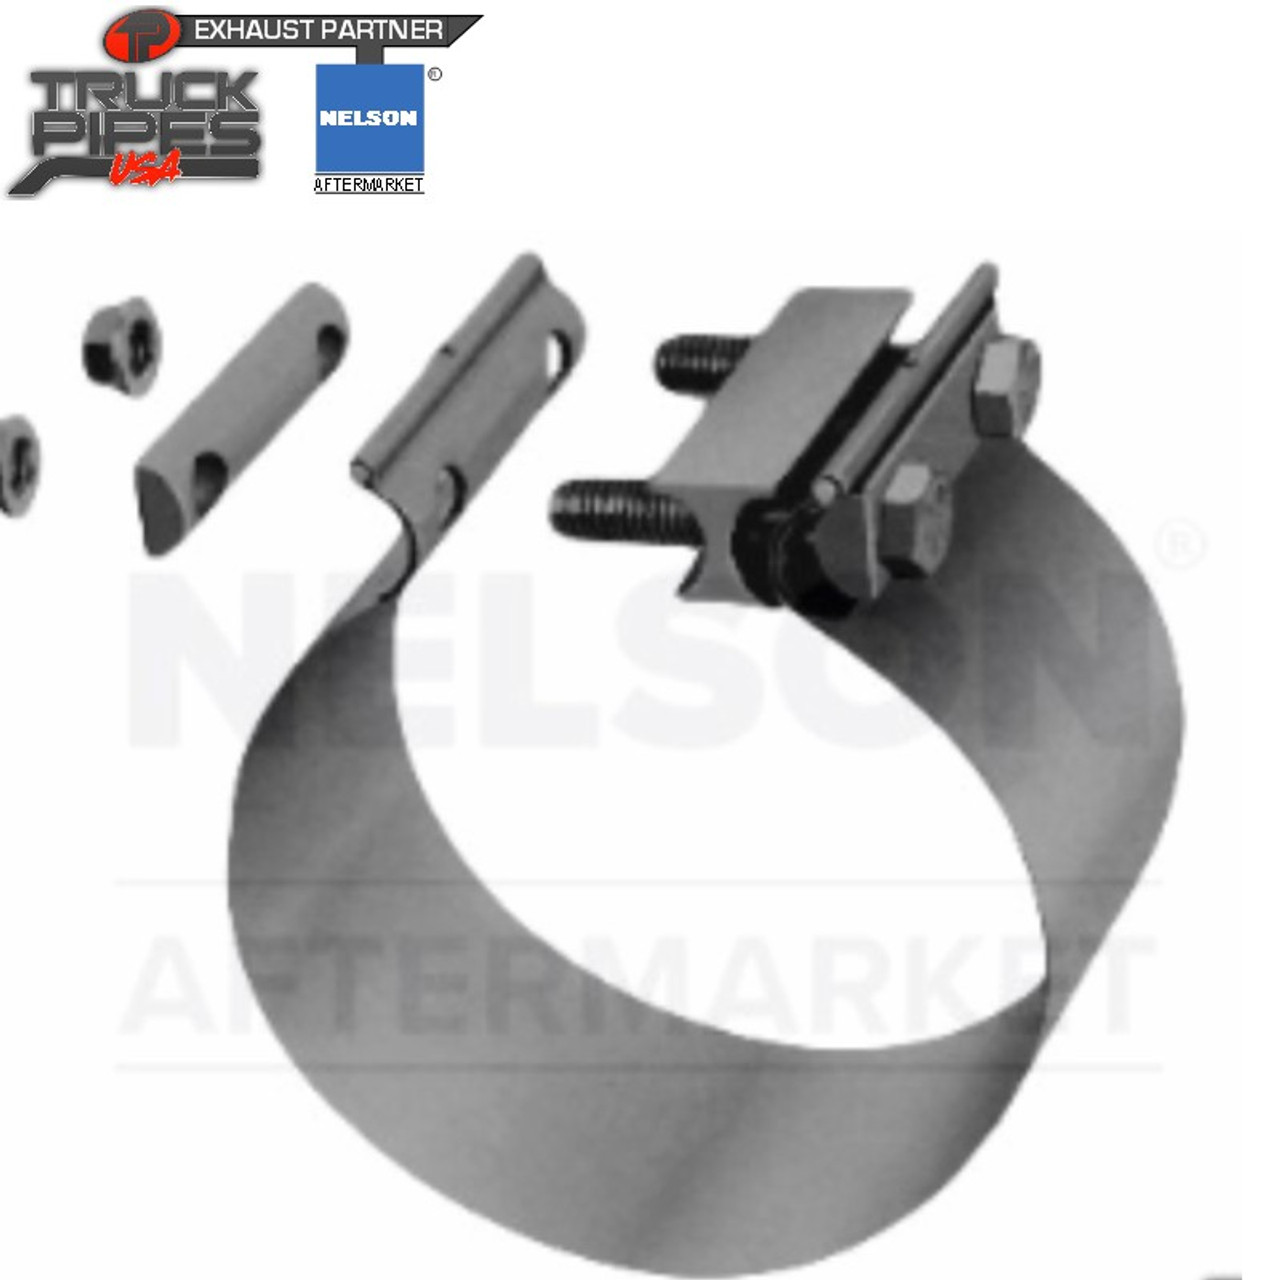 "2.5"" Torctite Butt Joint Exhaust Clamp Aluminized Nelson 90372A"